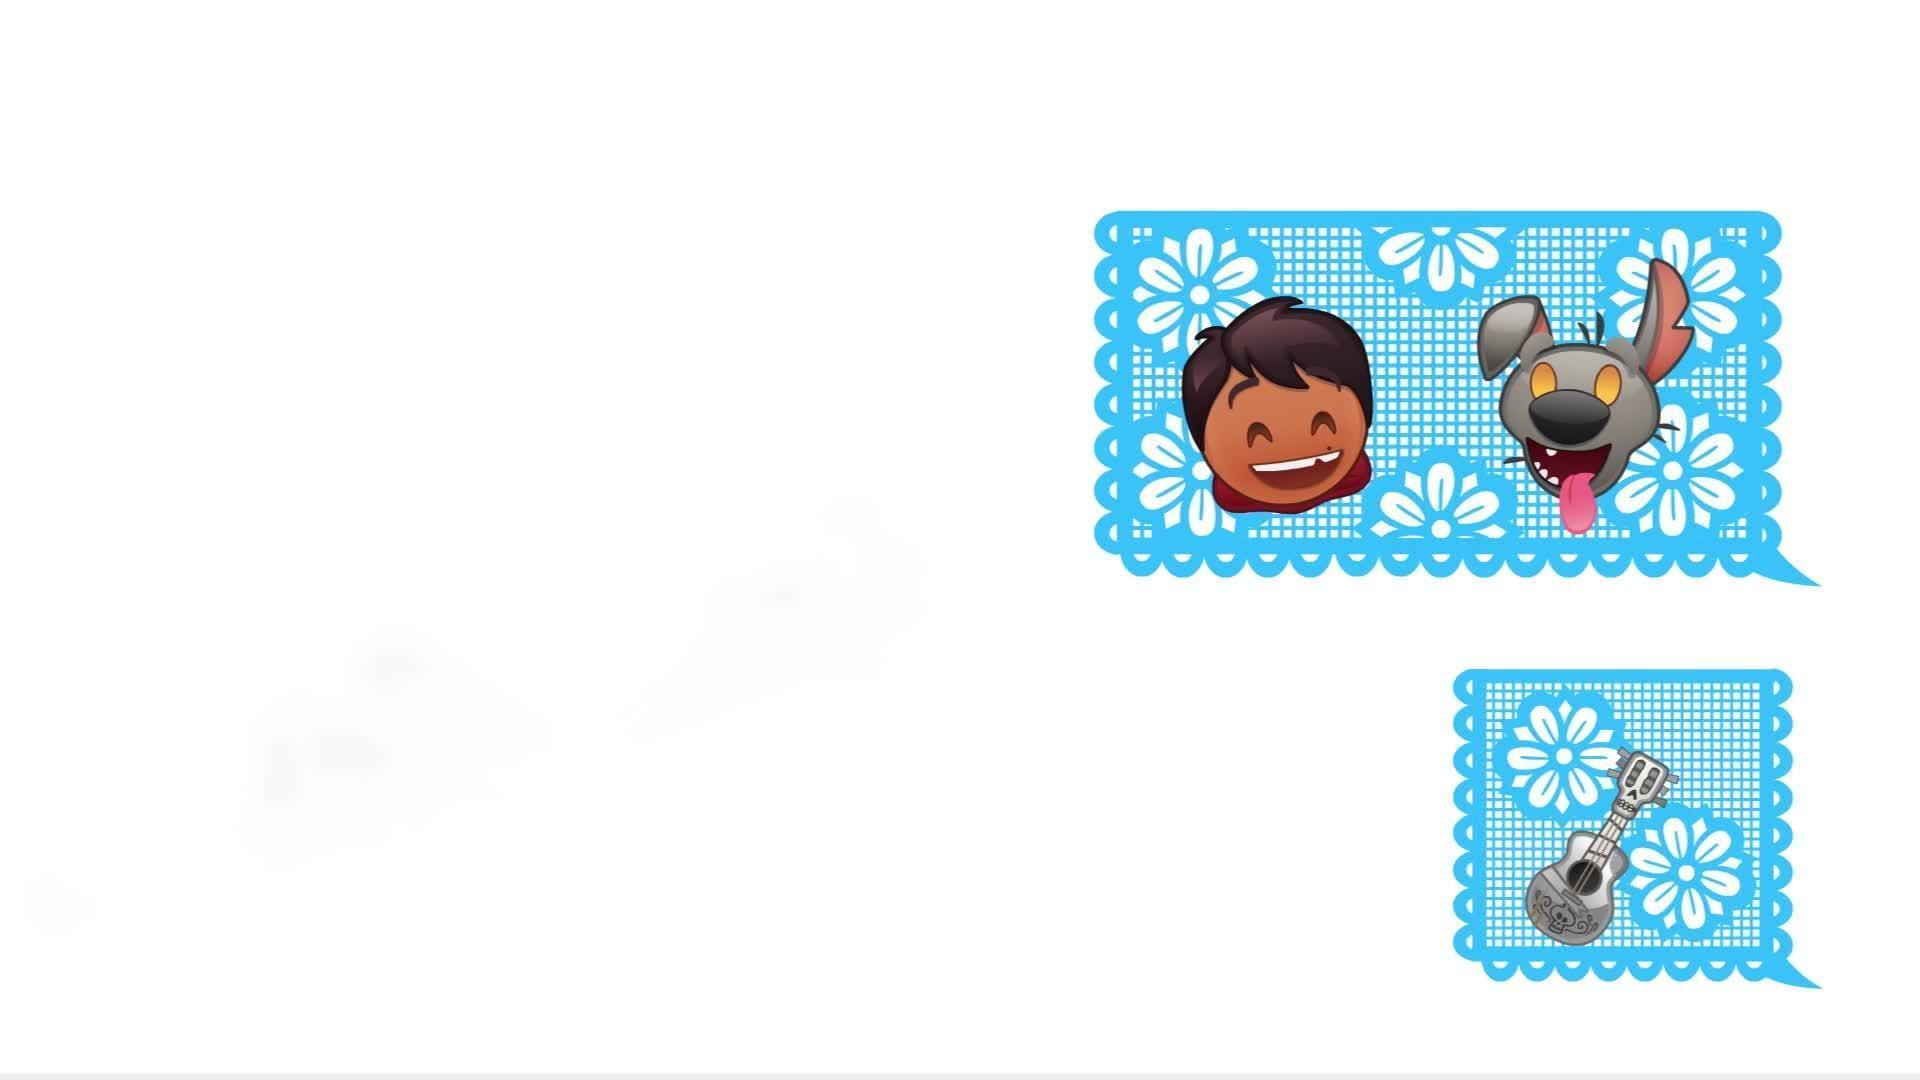 Coco | Disney As Told By Emoji